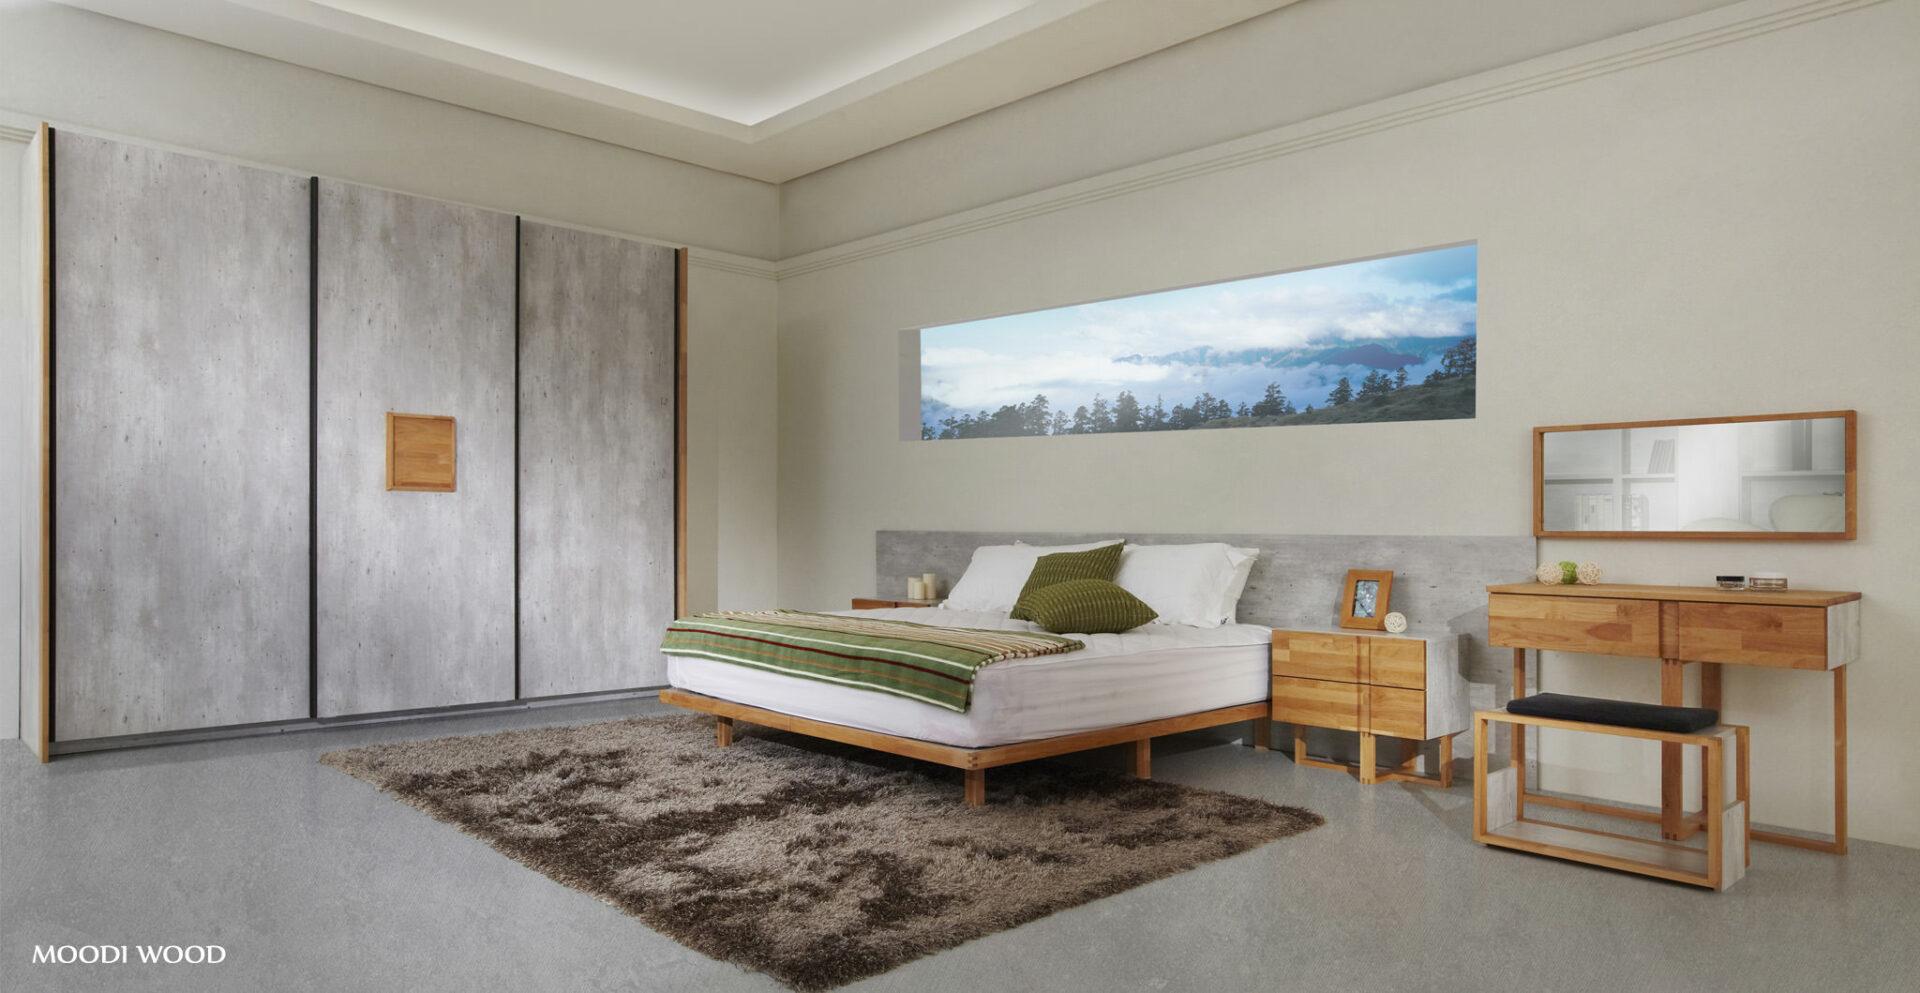 moodi-wood_20161118_fm-bedroom_210